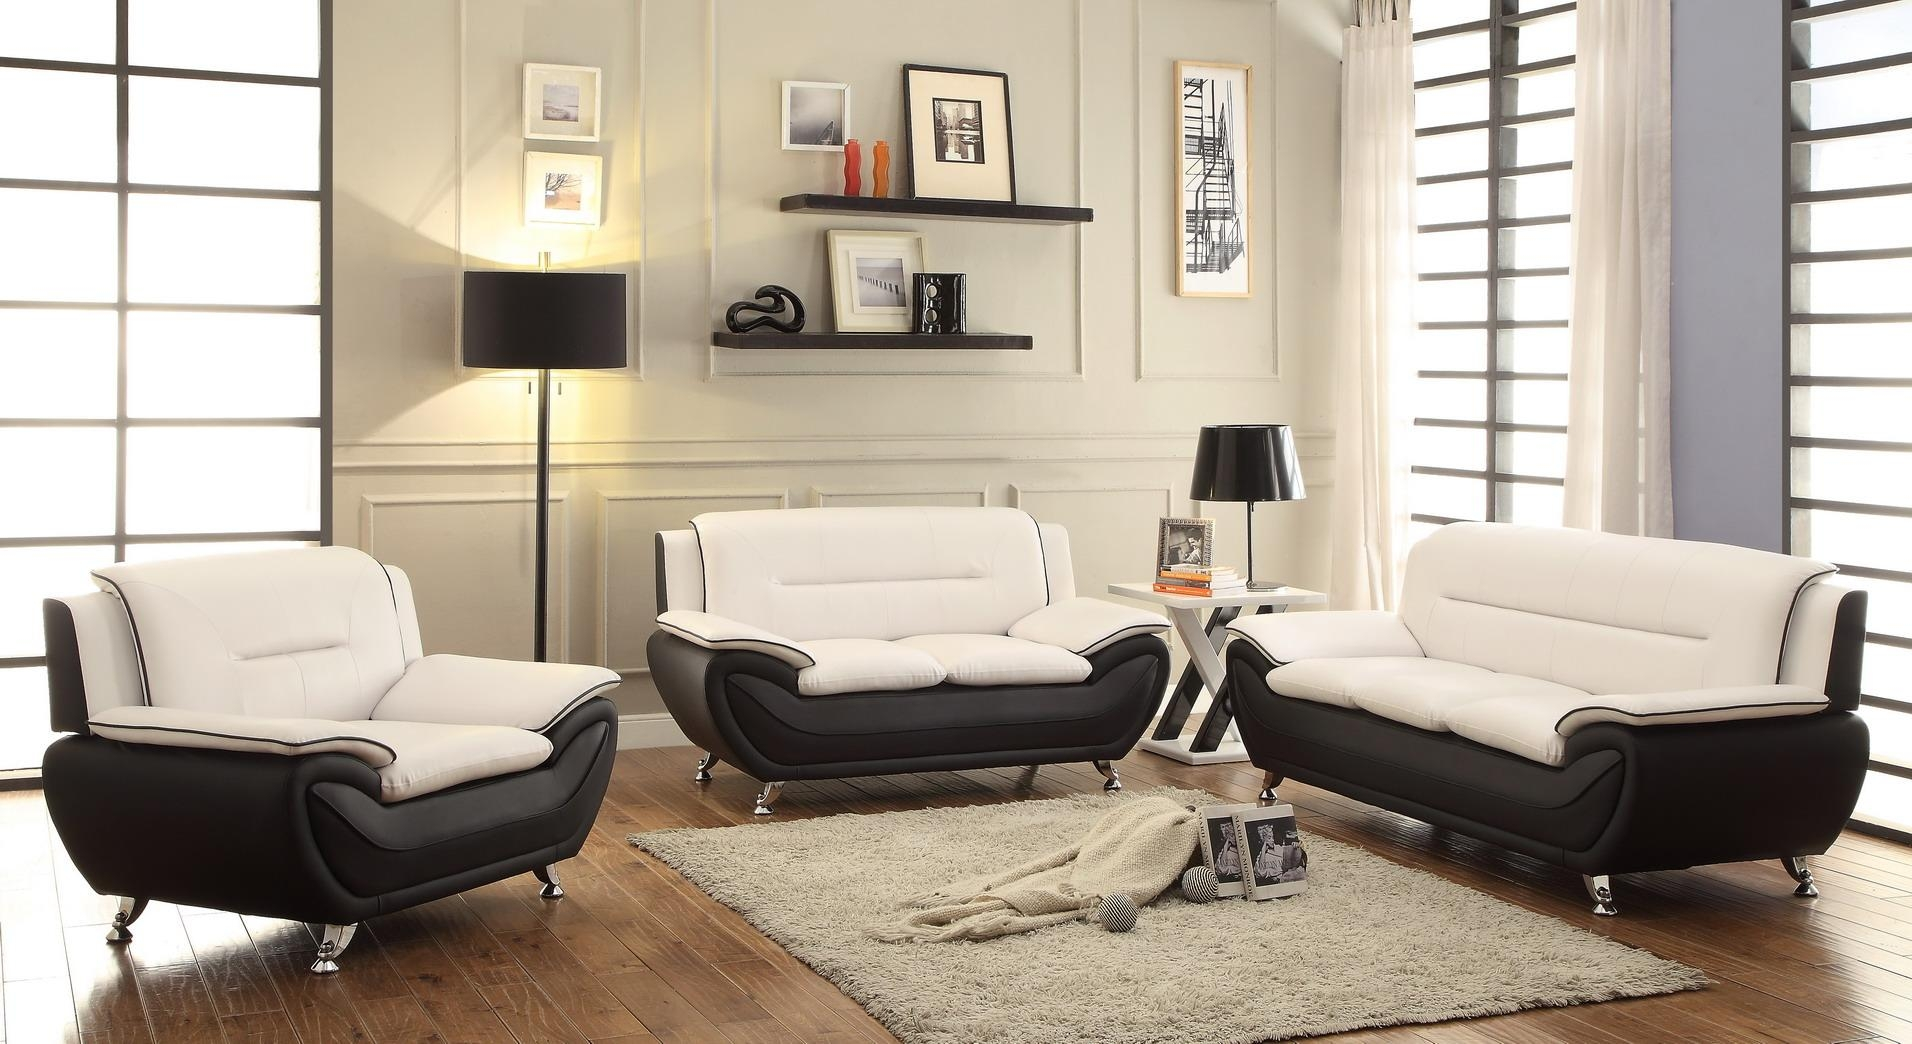 Ava Furniture Houston – Cheap Discount Contemporary Furniture In In Cheap Sofas Houston (View 2 of 20)